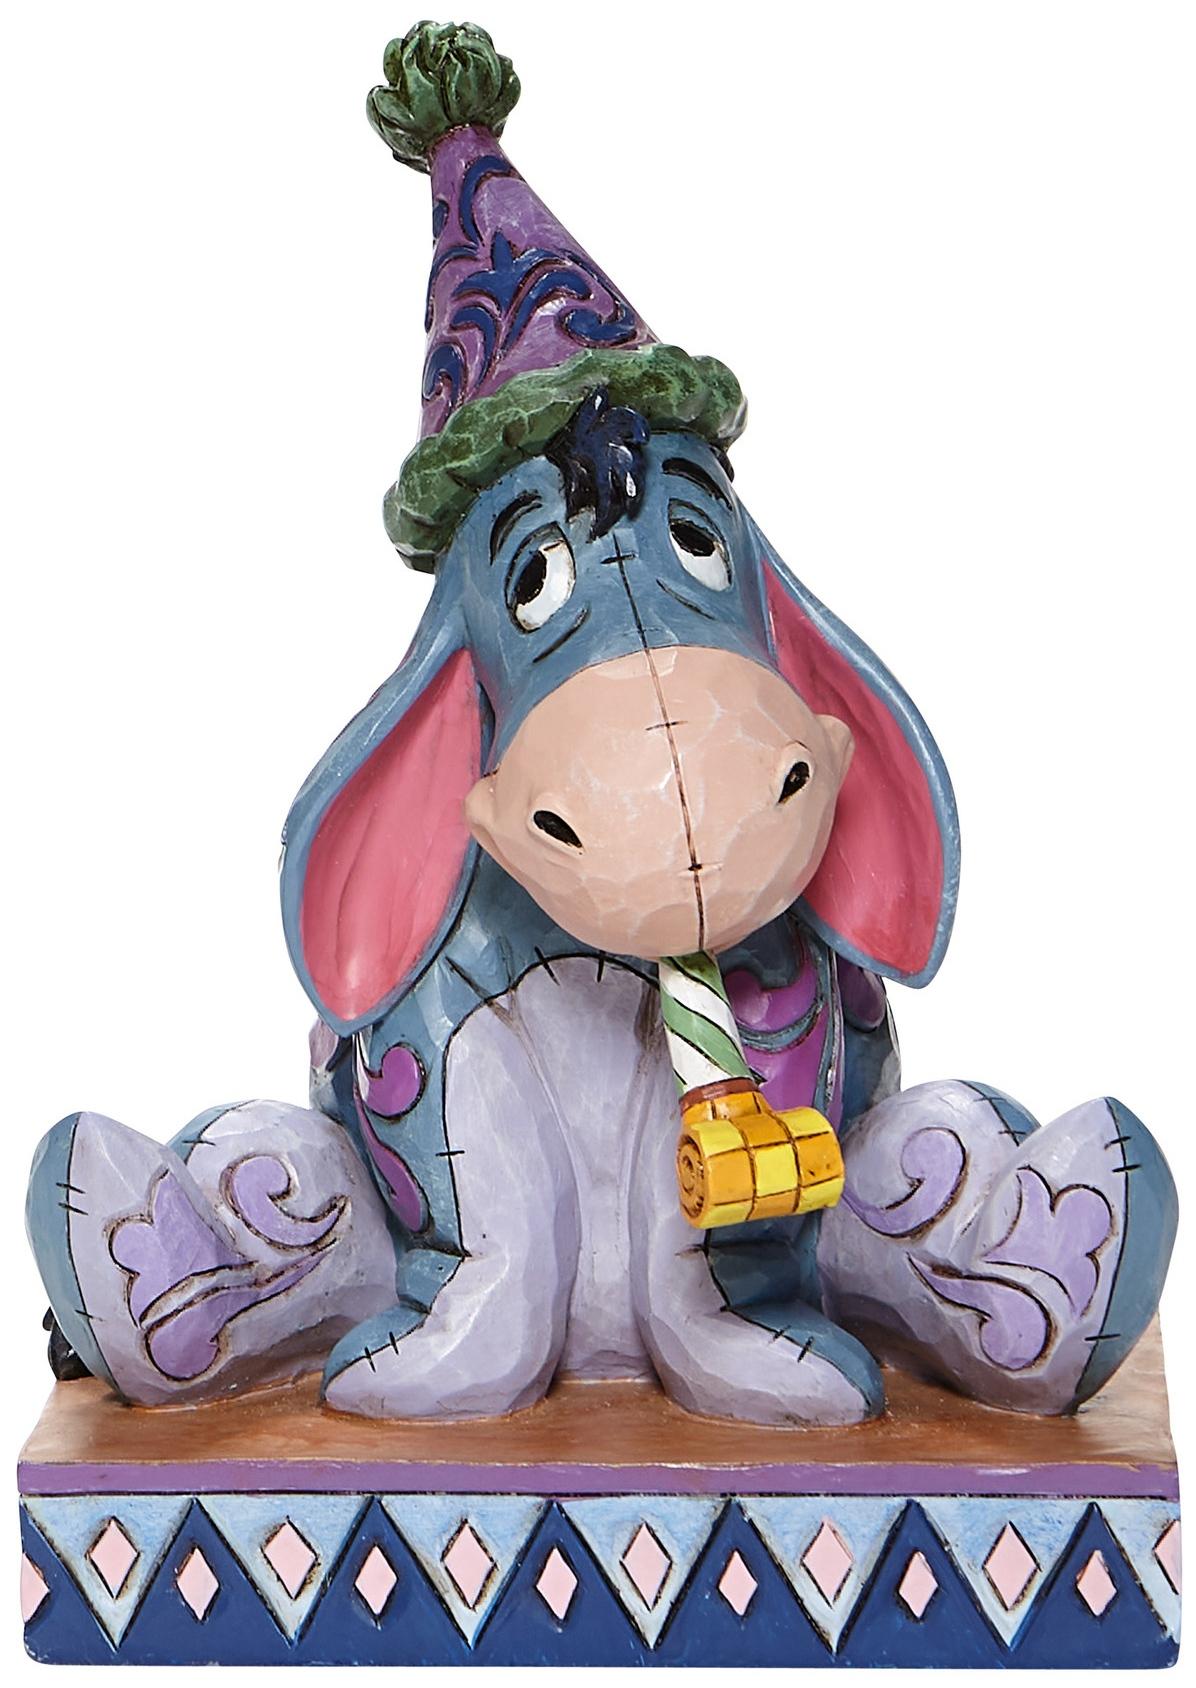 Disney Traditions by Jim Shore 6008074N Eeyore with Birthday Hat Figurine